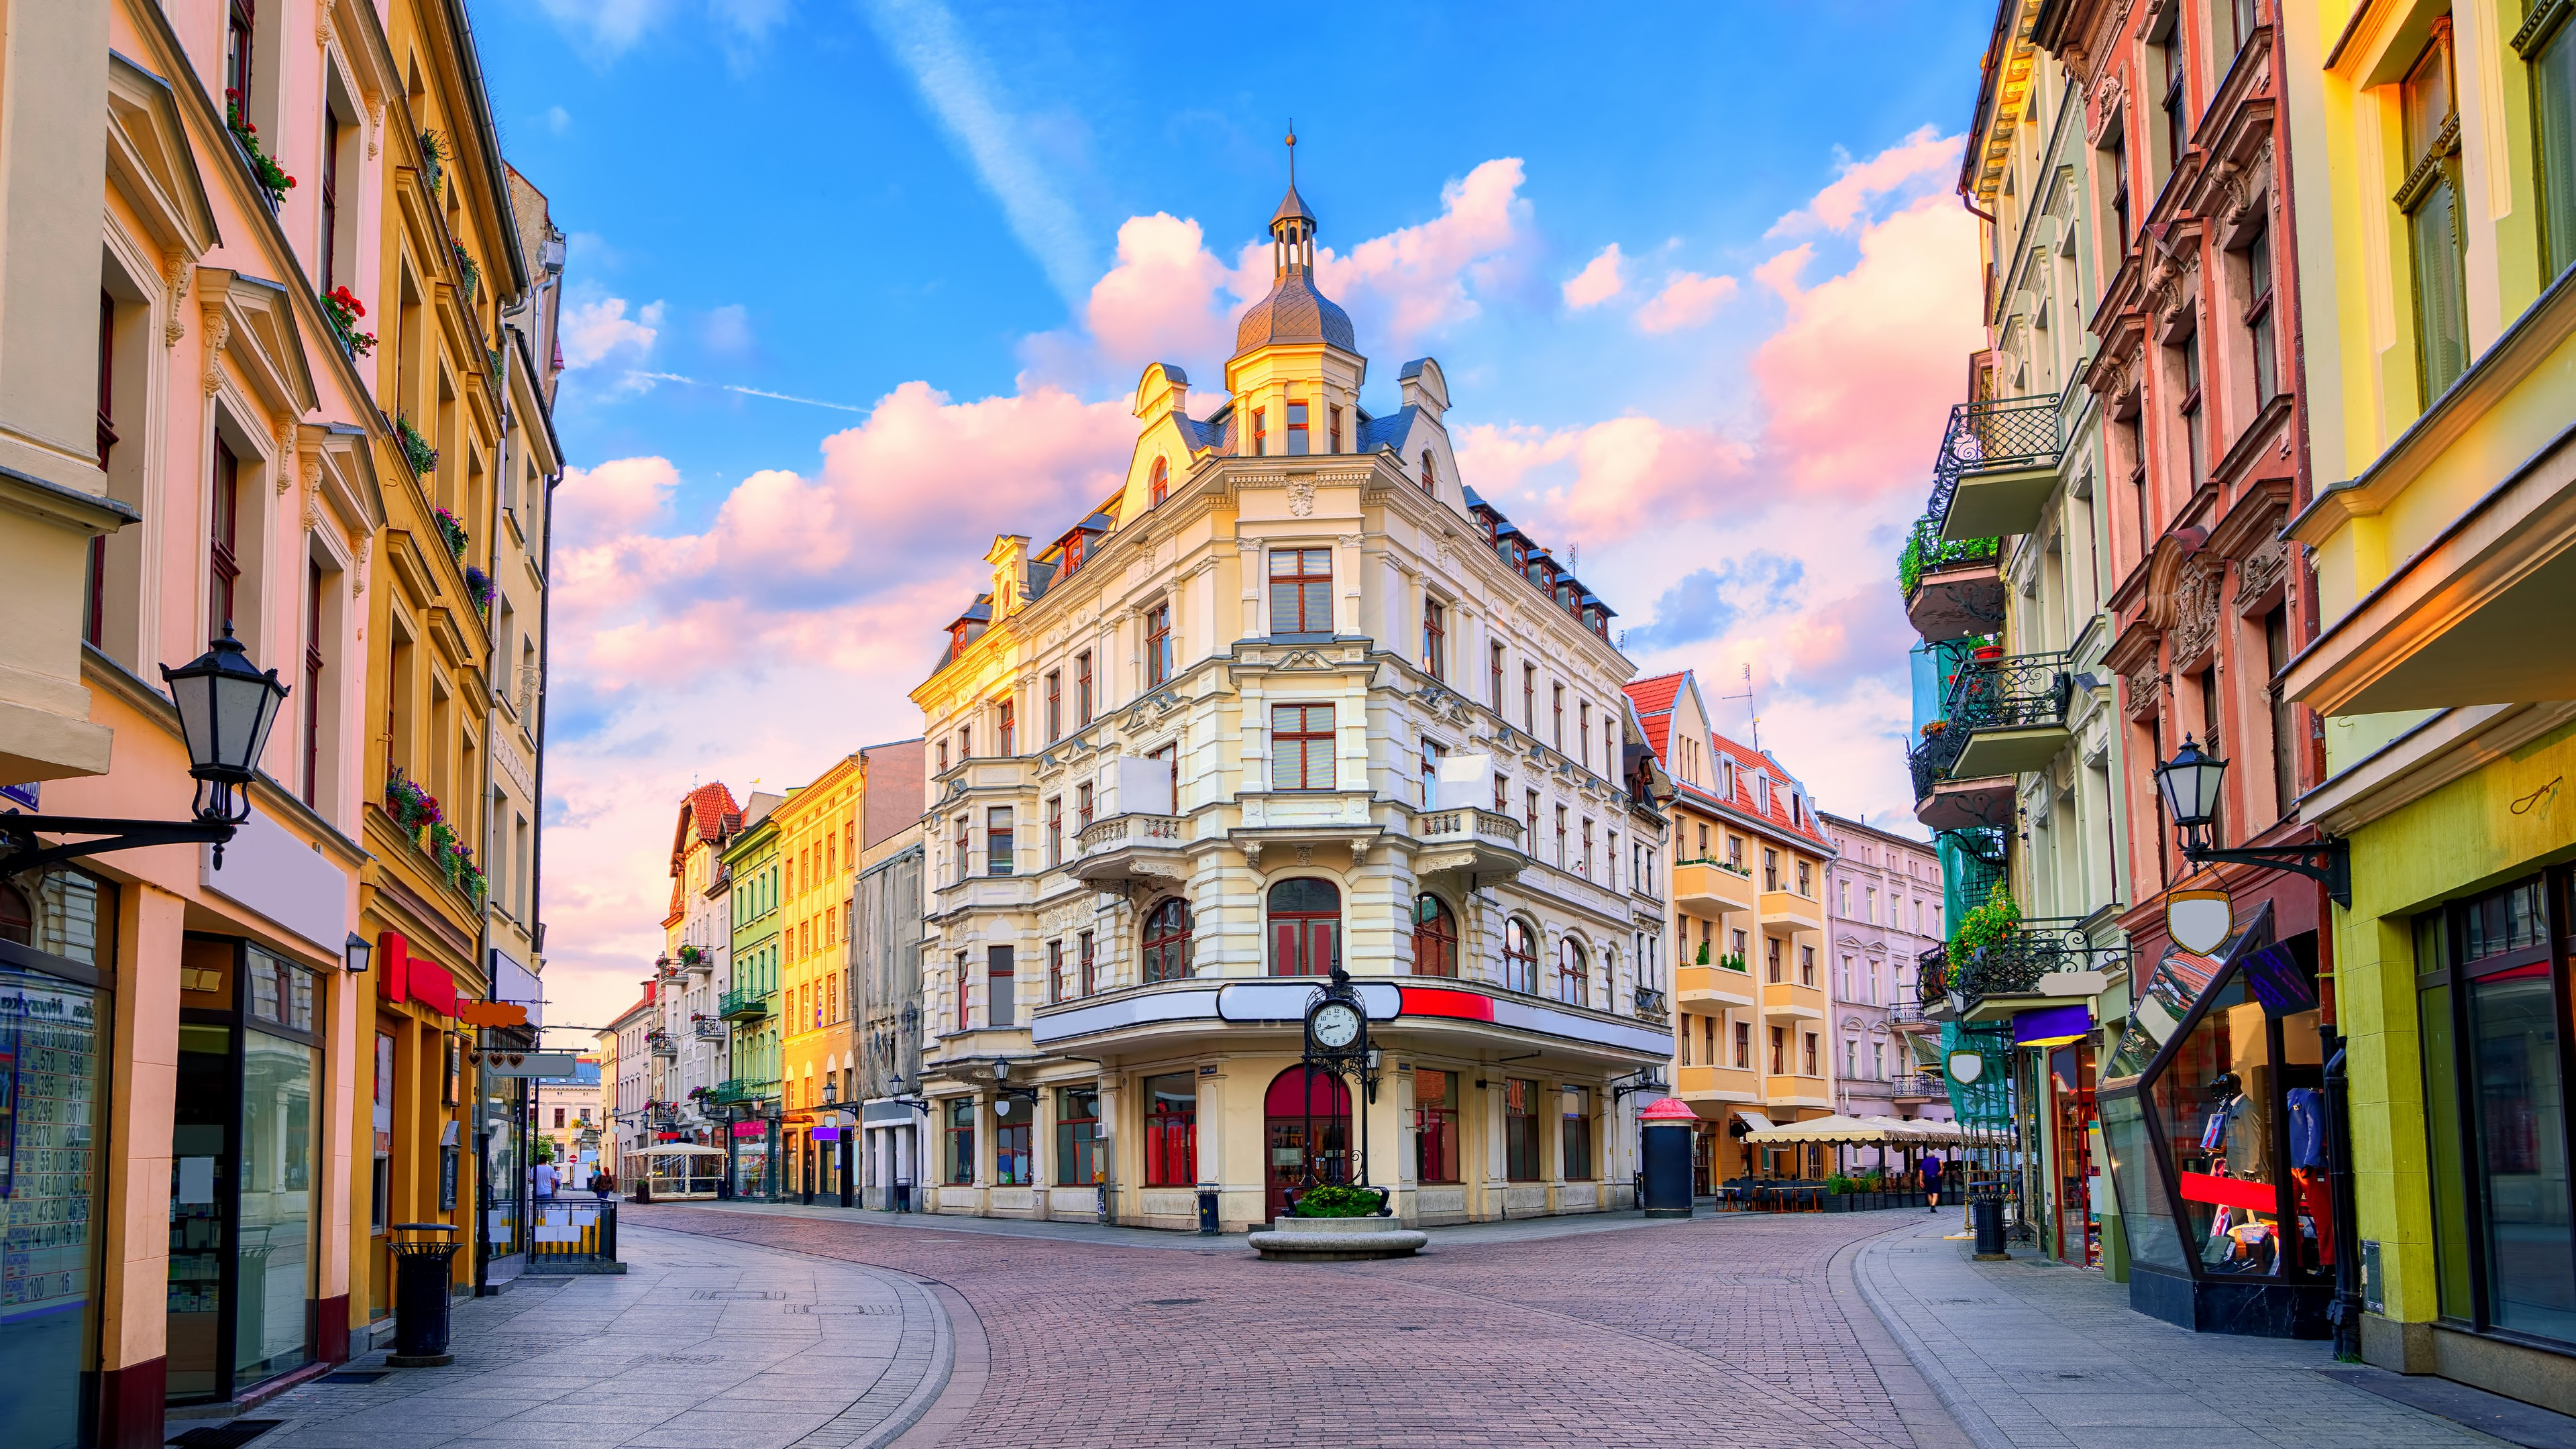 Empik Store In Toru Poland 4K UltraHD Wallpaper 3840x2160